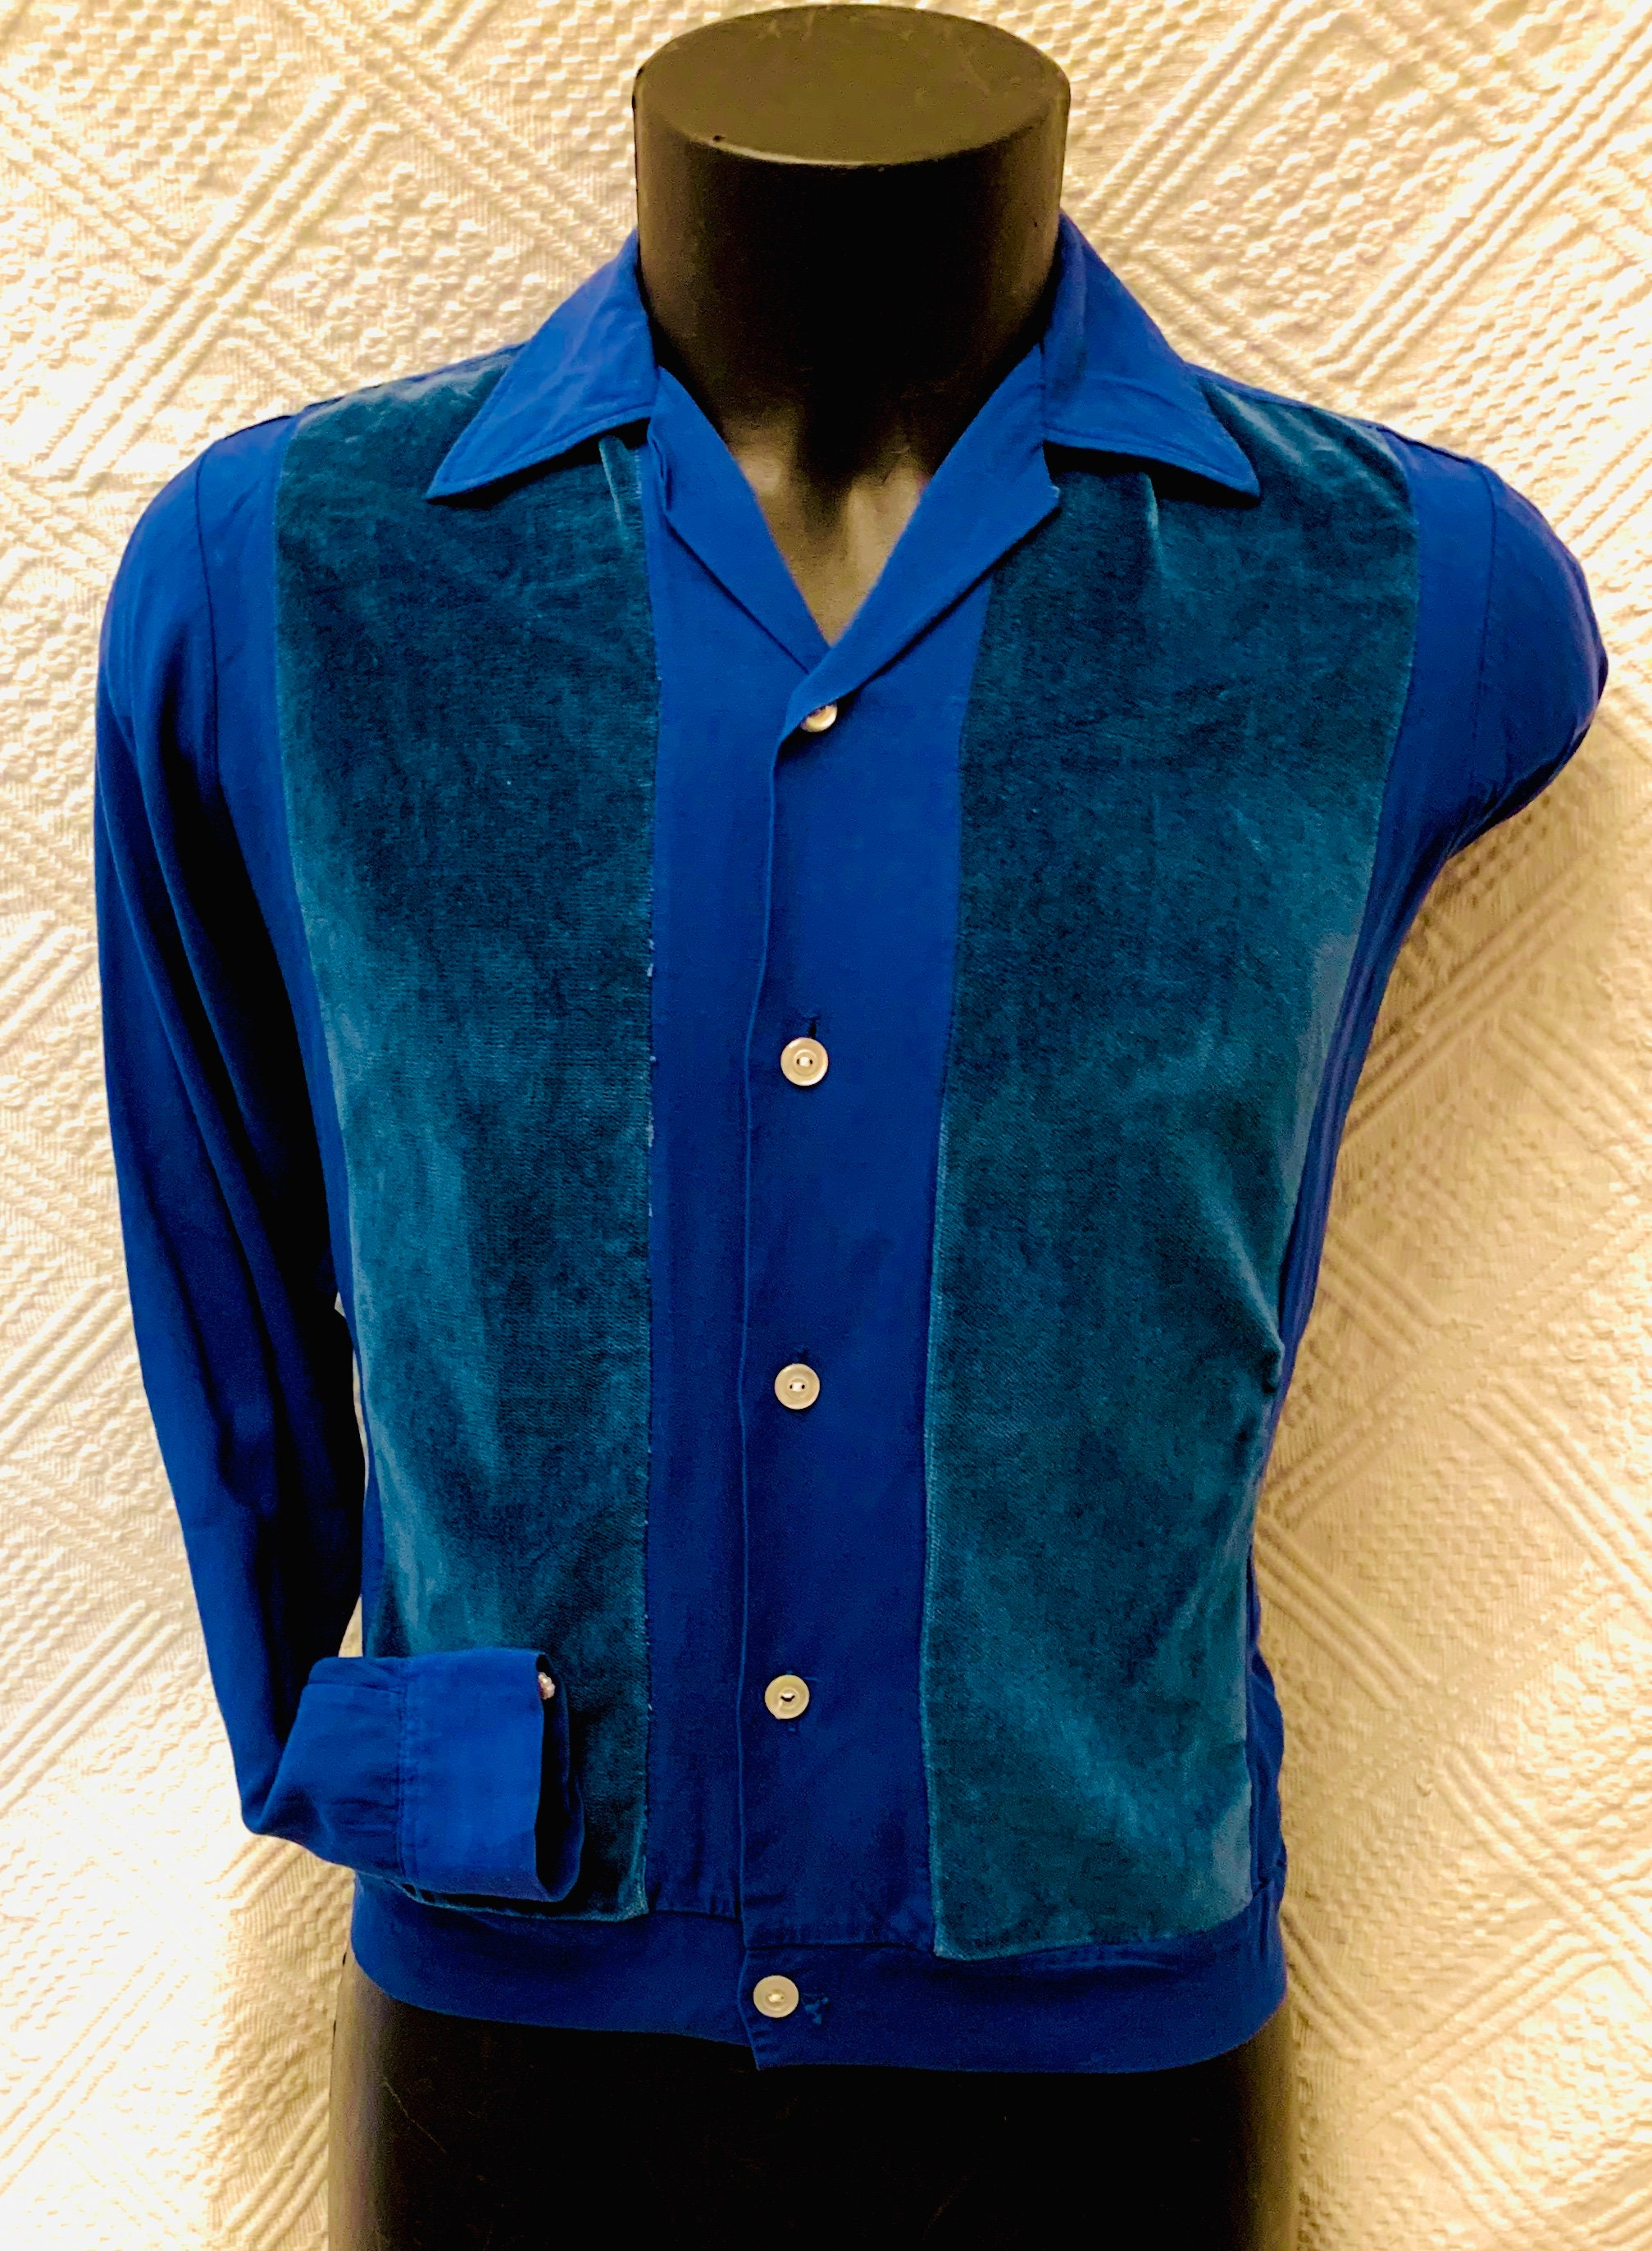 1950s Men's Ties, Bow Ties – Vintage, Skinny, Knit 1950s Mens Petrol Blue Velvet Panelled Long Sleeve Shirt Jac $176.63 AT vintagedancer.com